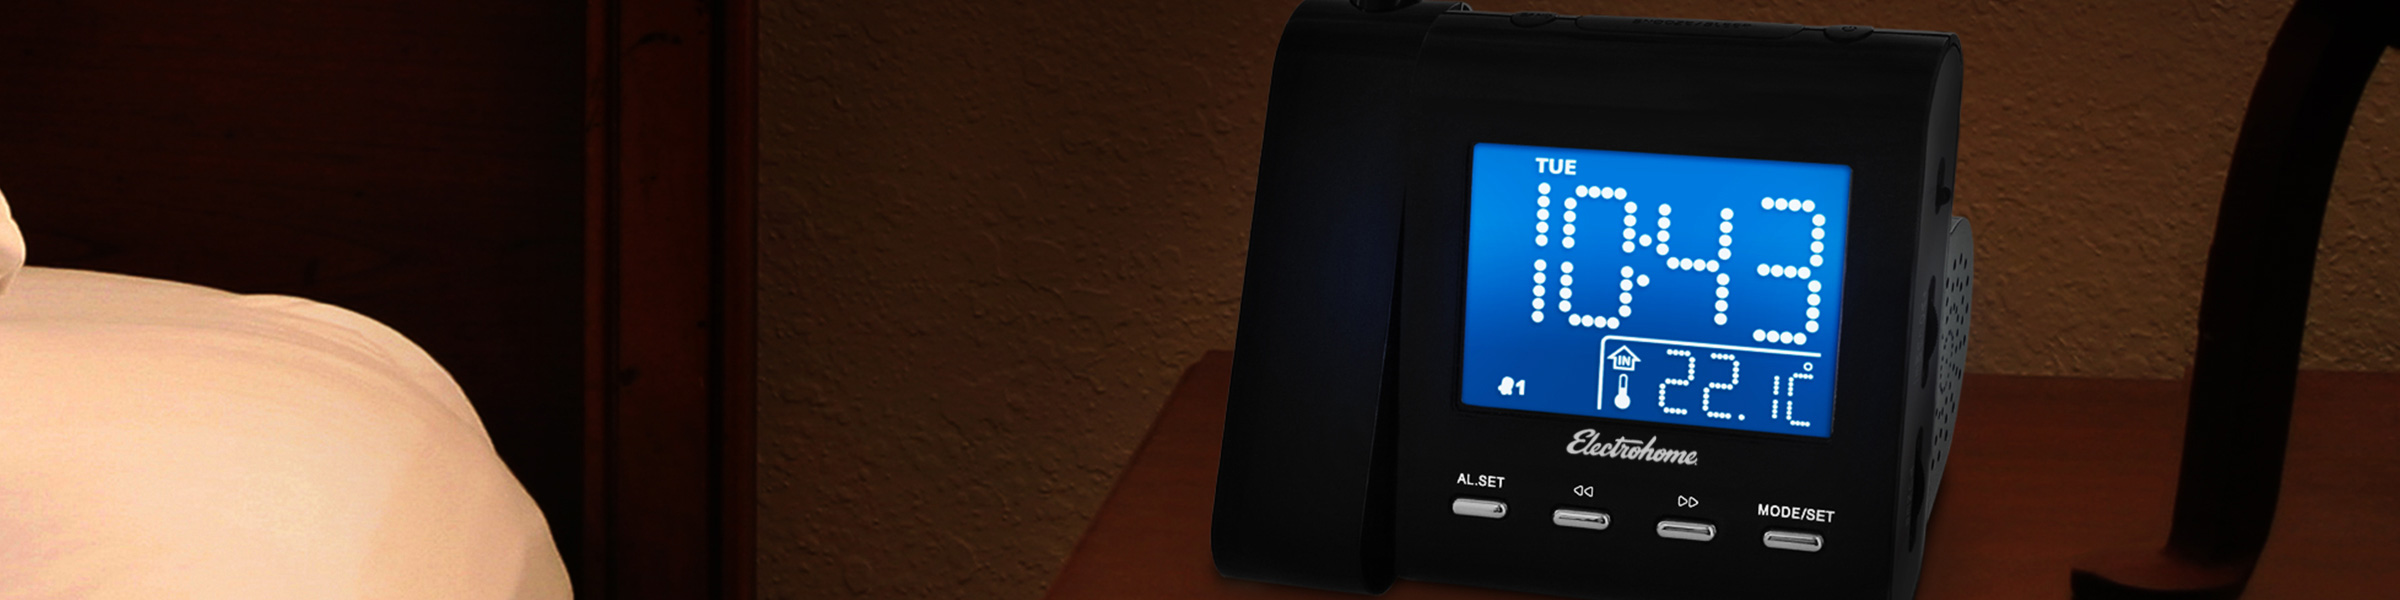 Digital Alarm Clock Radios